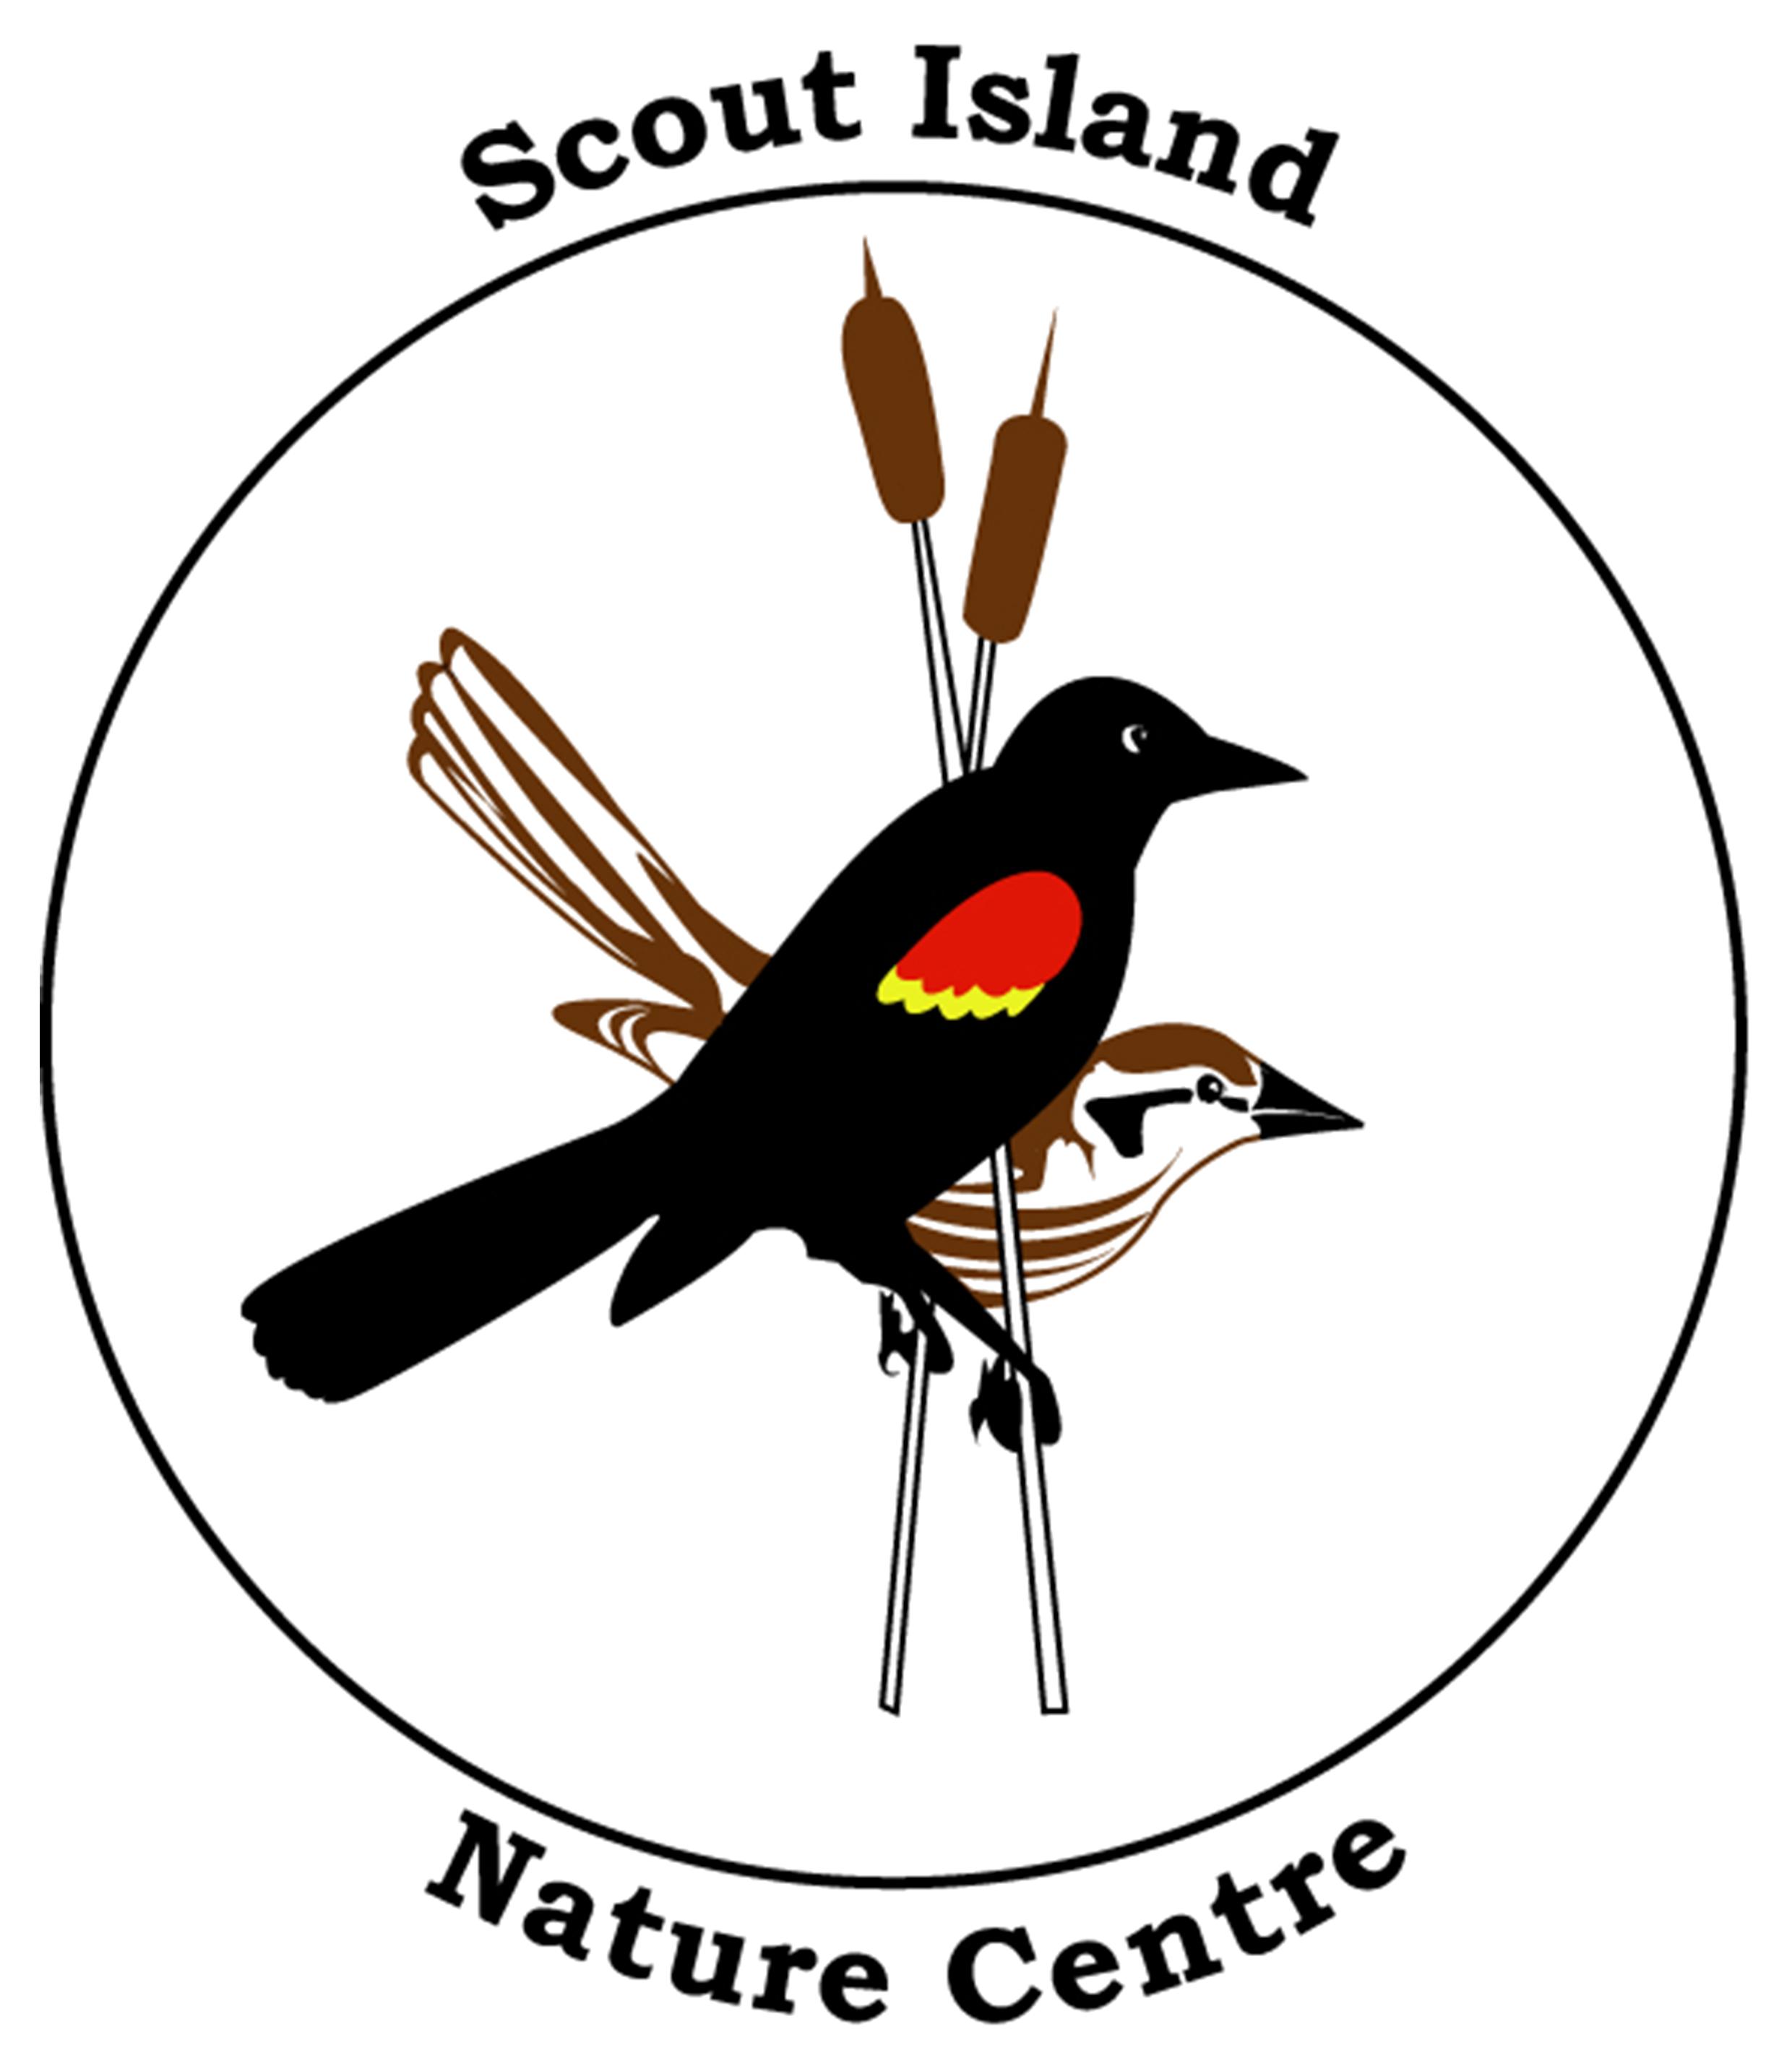 Scout island nature centre logo transparent